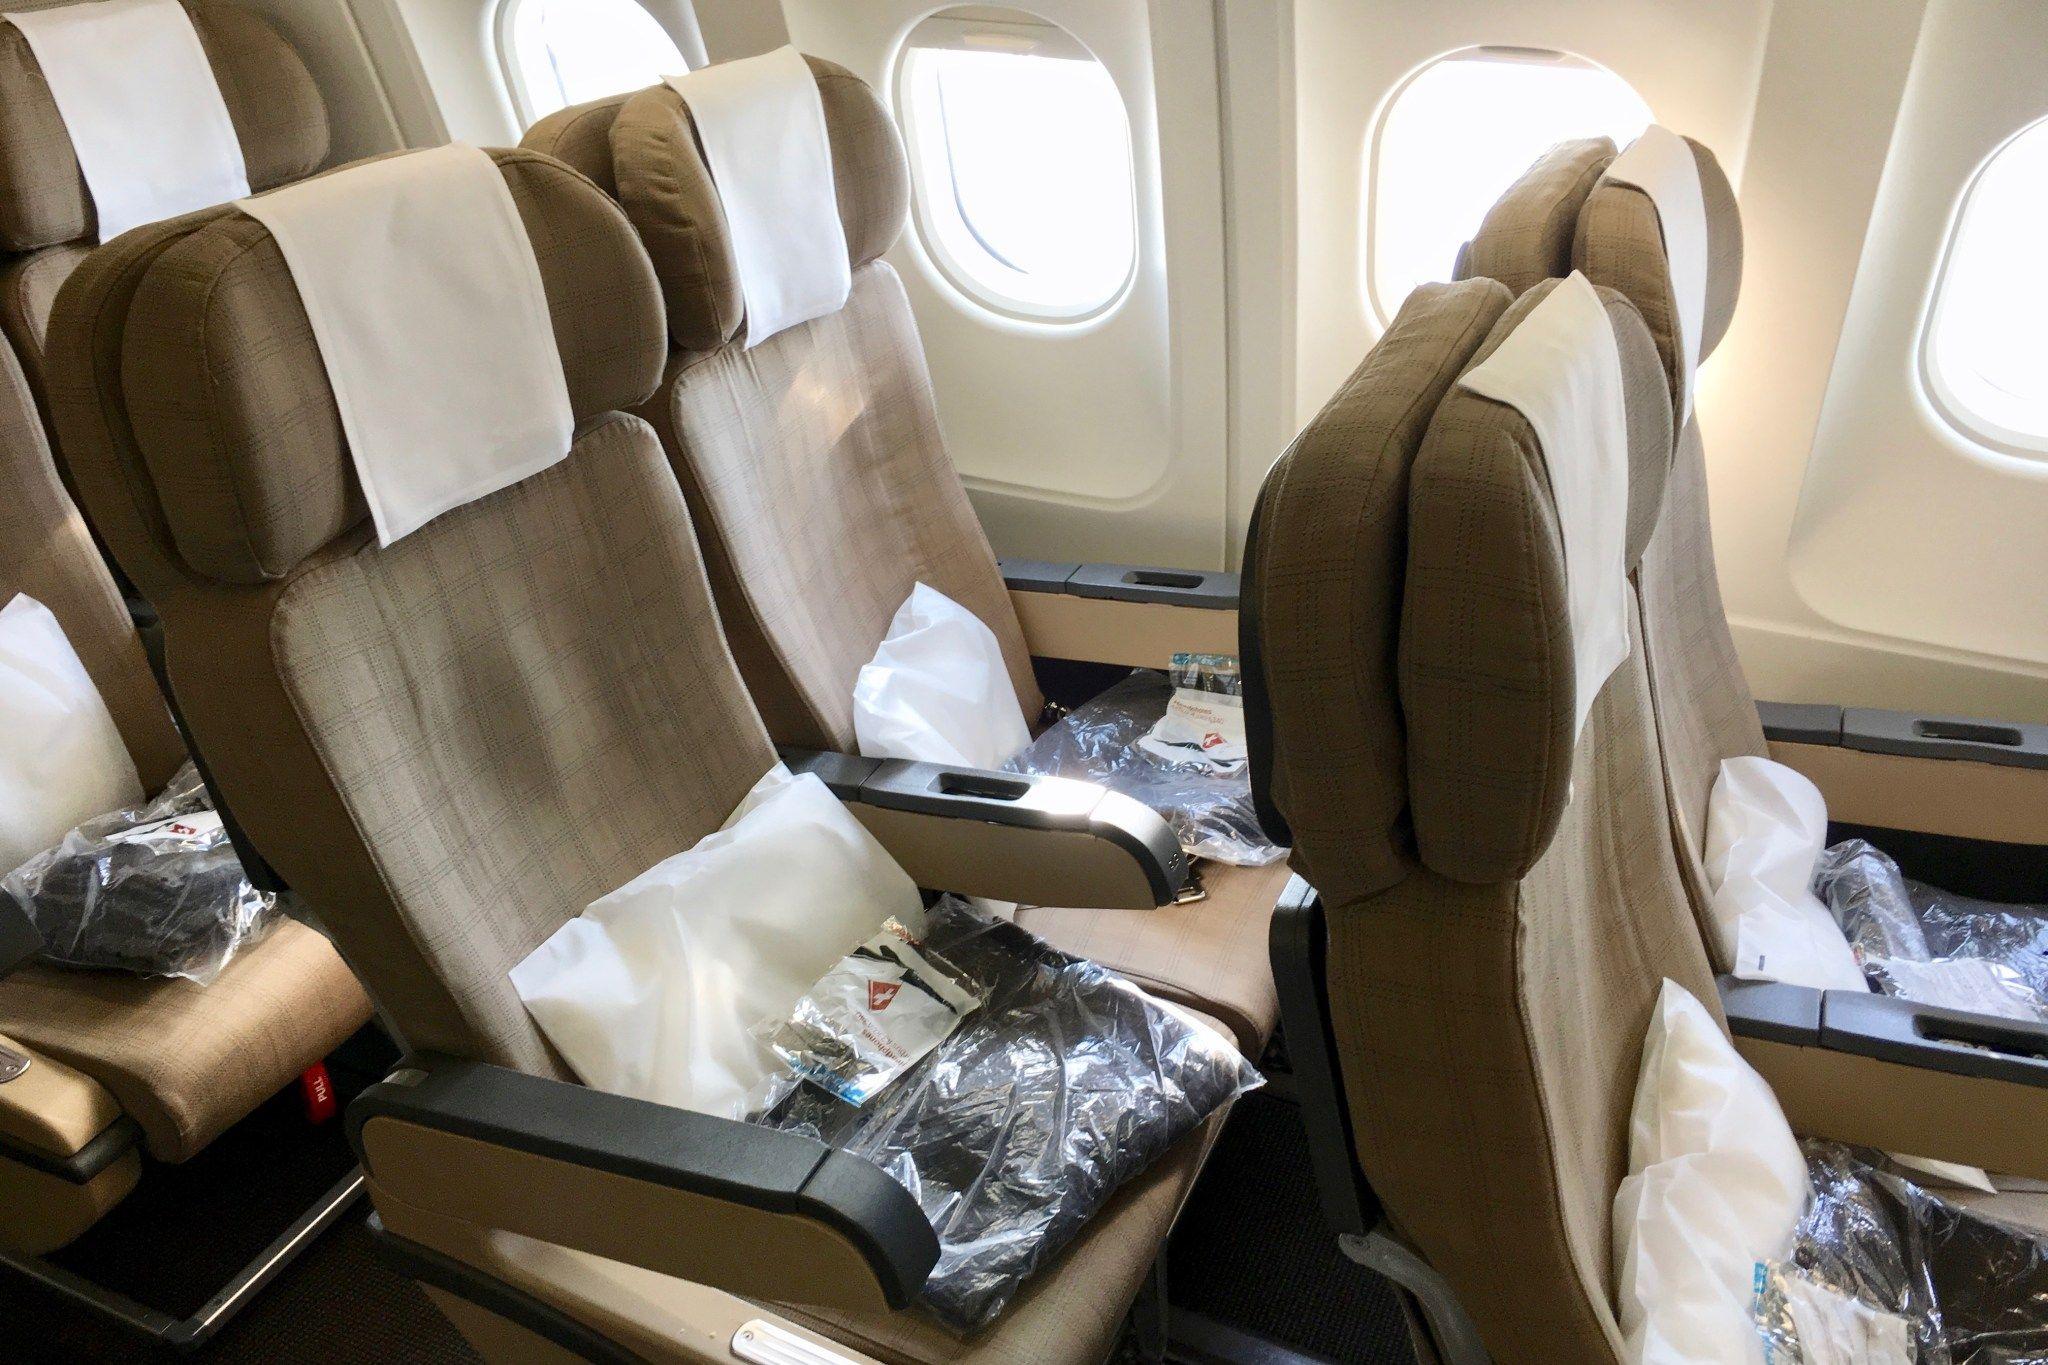 Flight review swiss a340300 economy zurich to boston